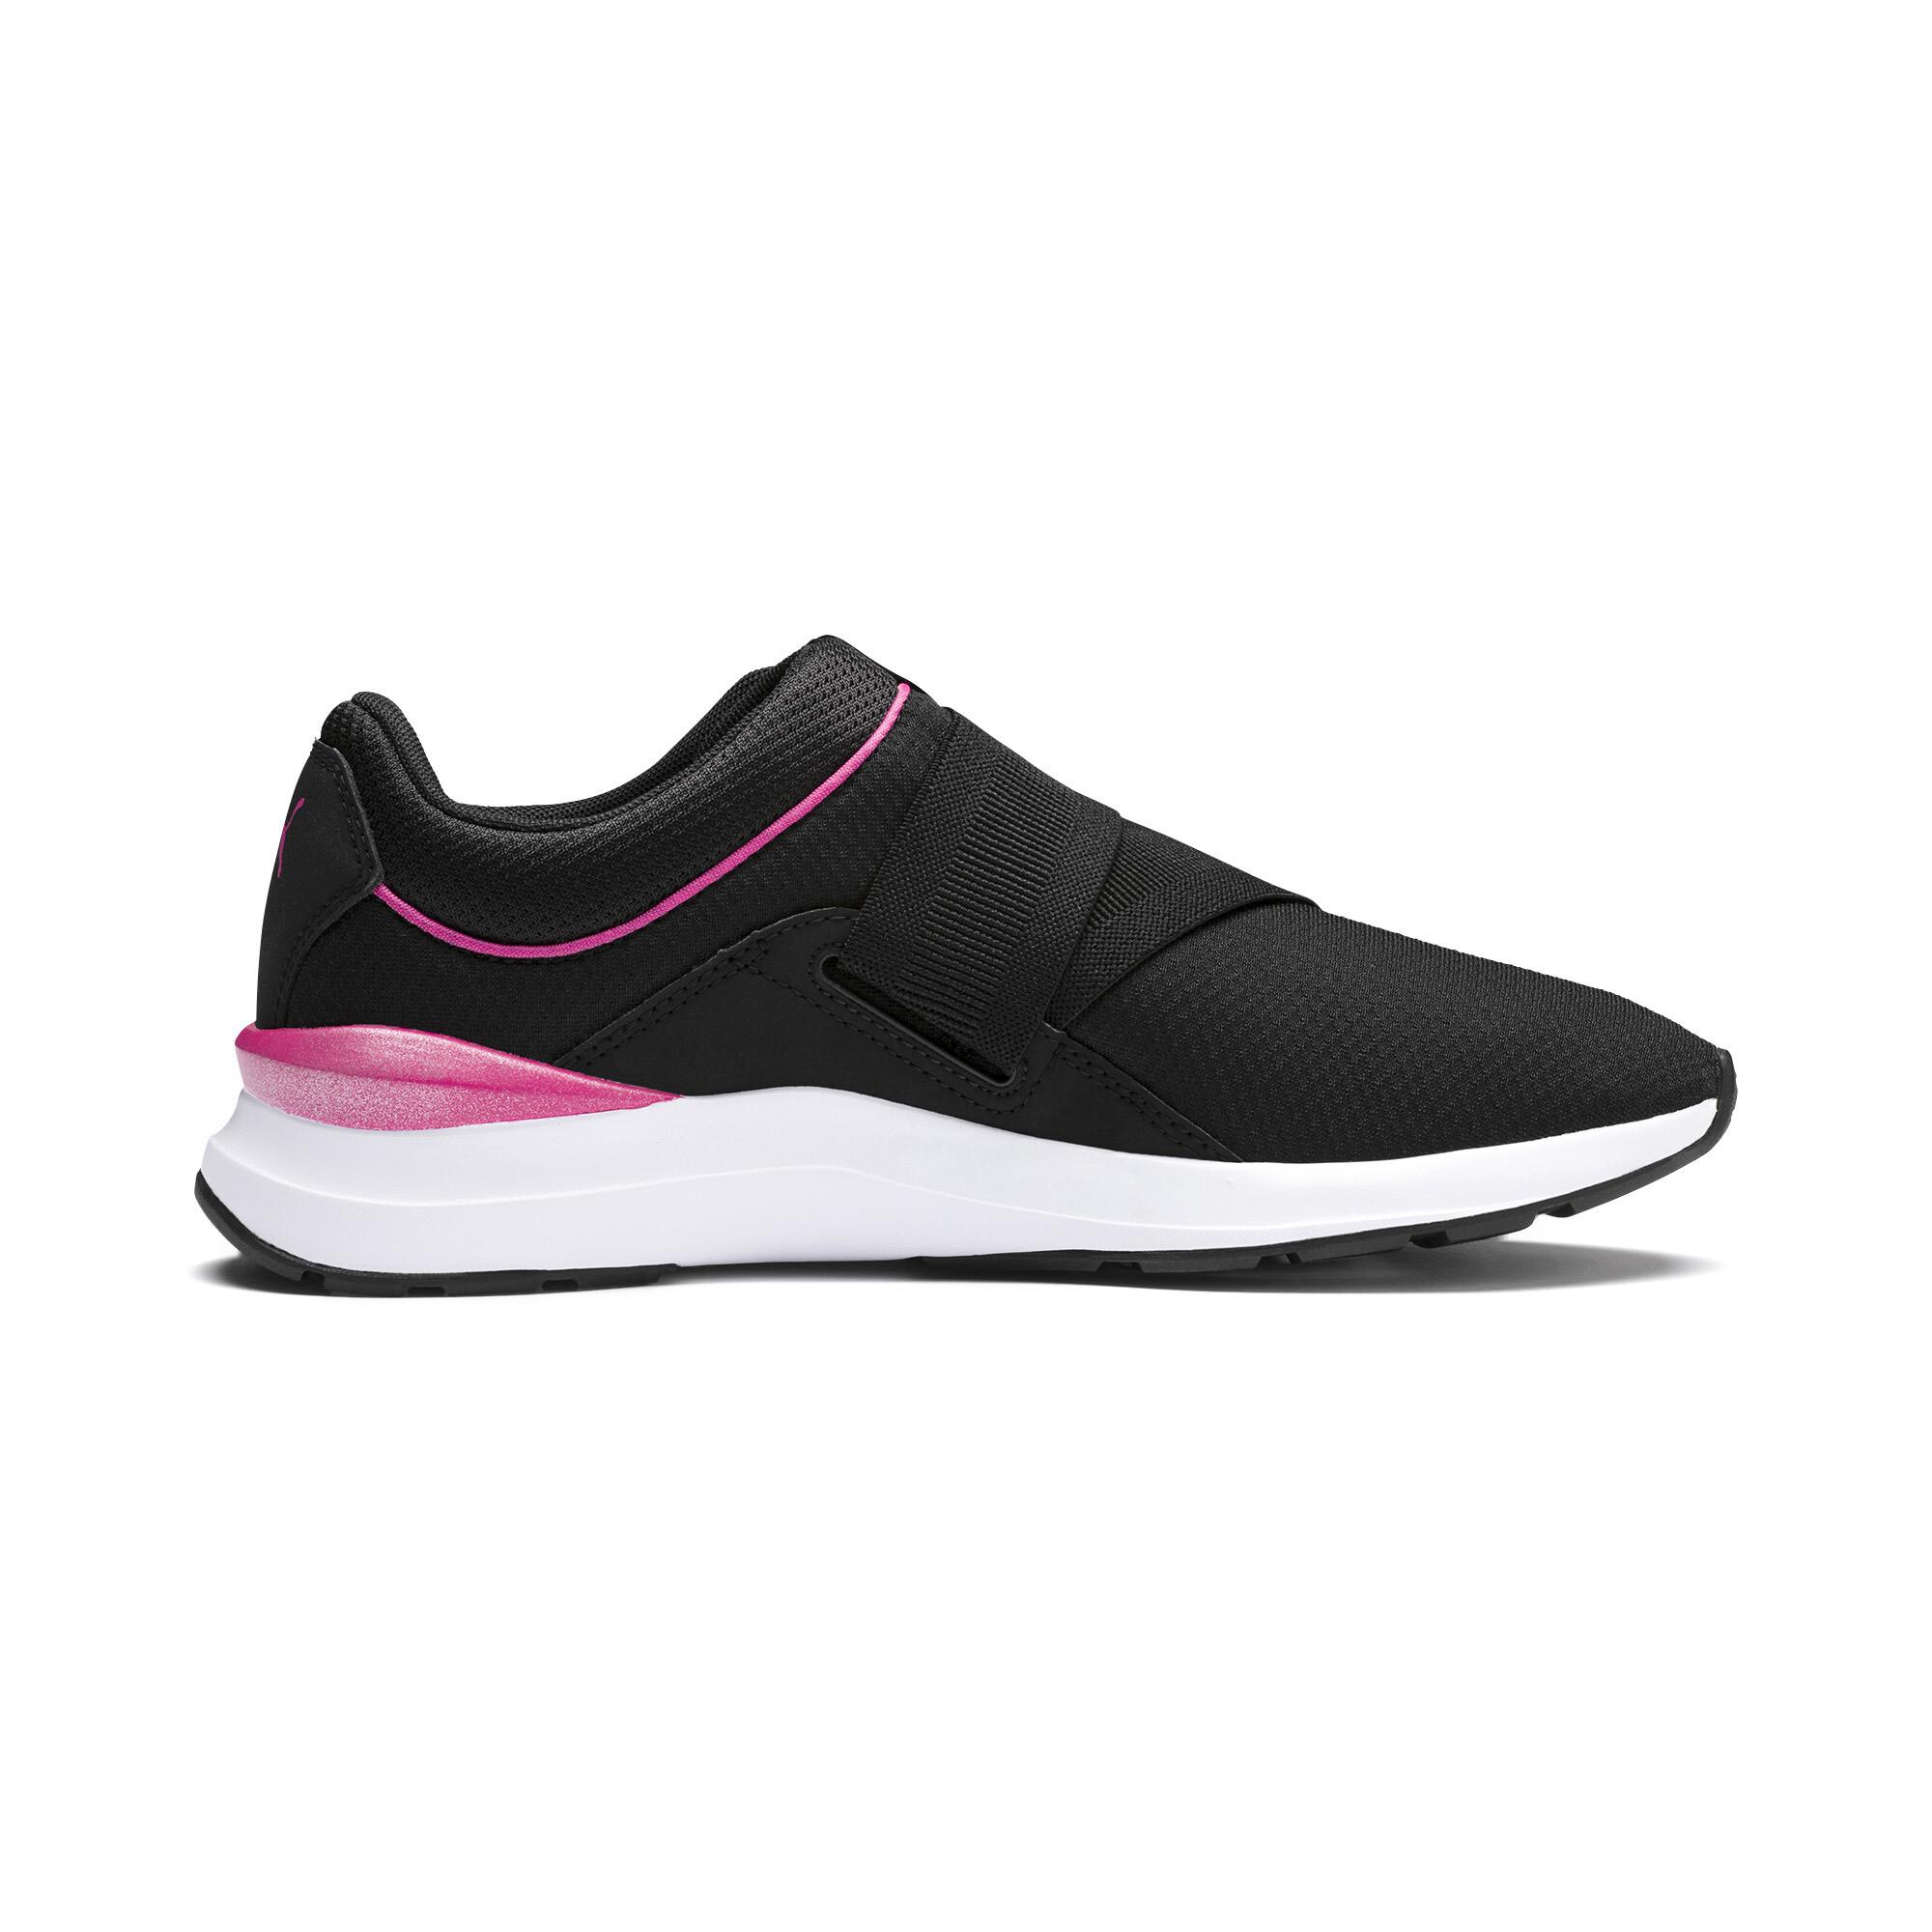 PUMA-Adela-X-Women-s-Sneakers-Women-Shoe-Basics thumbnail 11